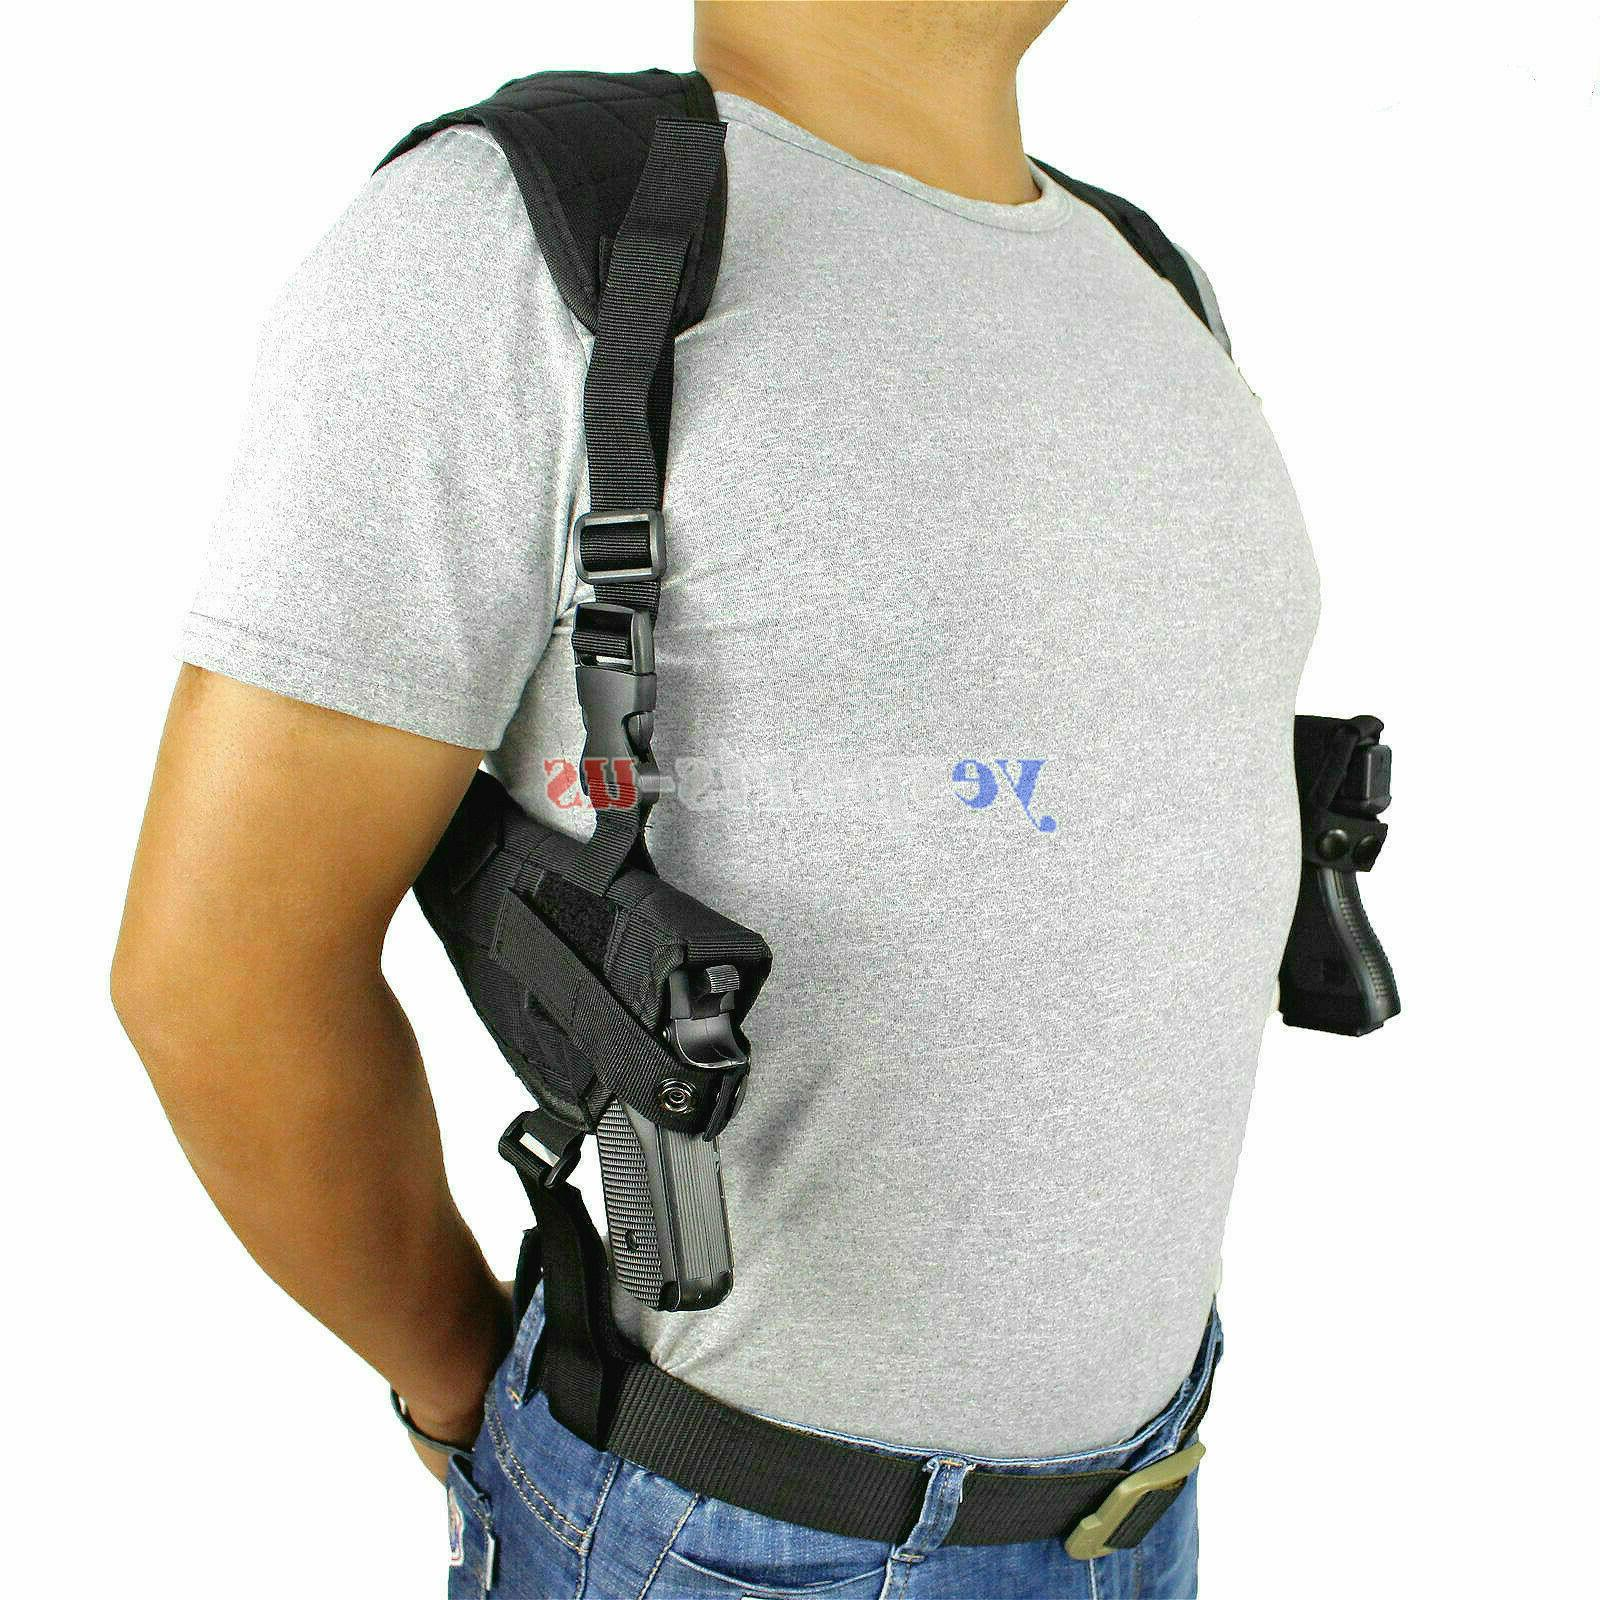 Tactical Double Shoulder Gun Pistol Holster